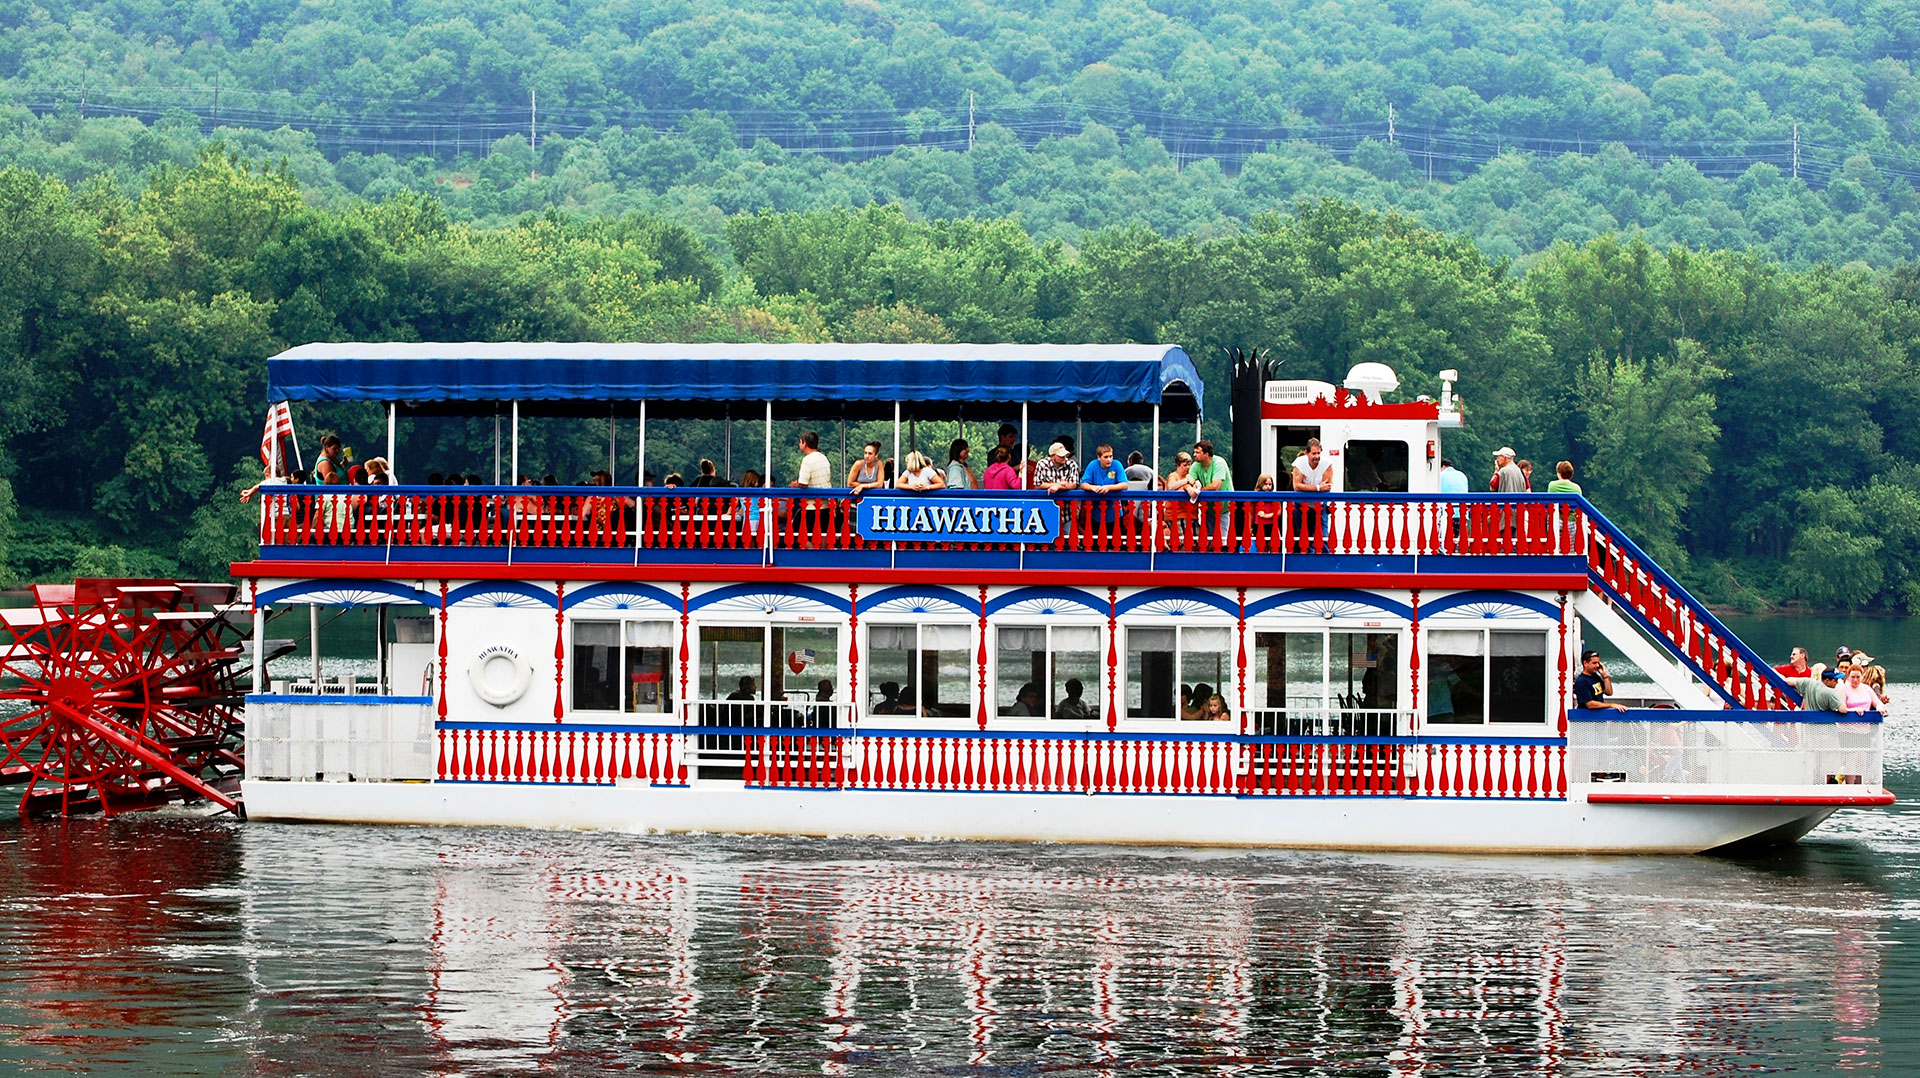 Hiawatha River Boat